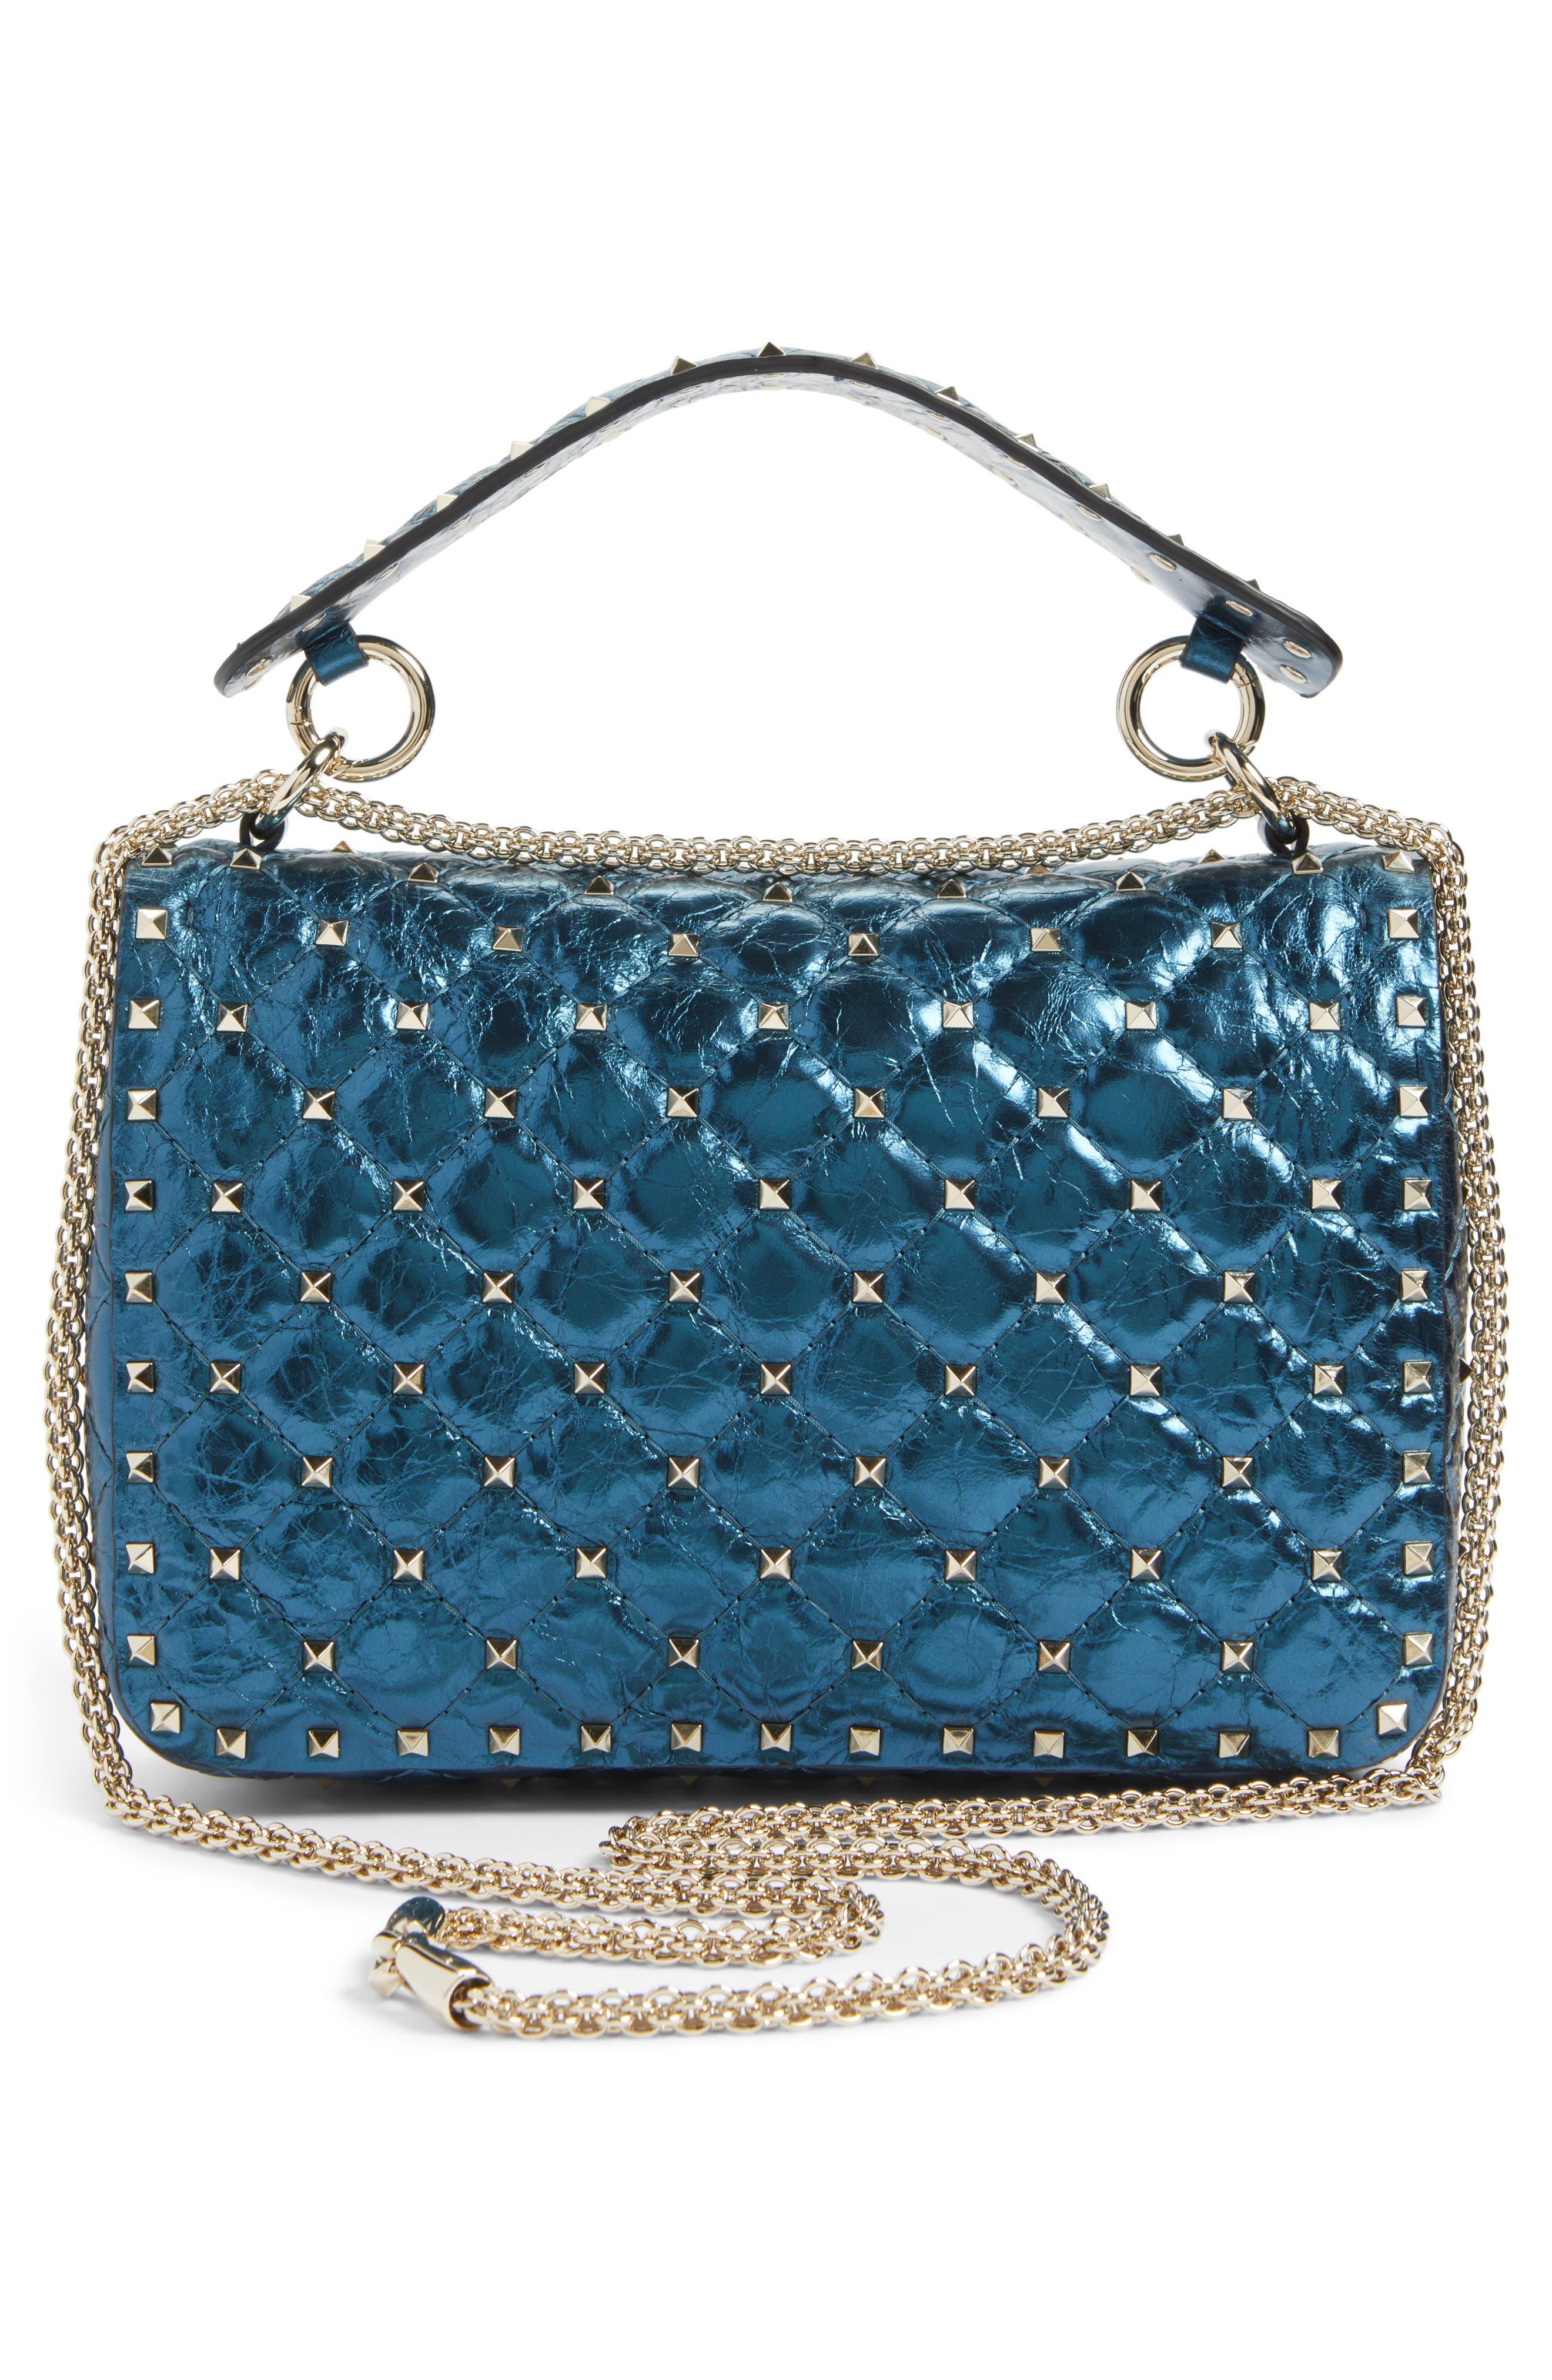 Medium Rockstud Spike Lambskin Shoulder Bag,                             Alternate thumbnail 3, color,